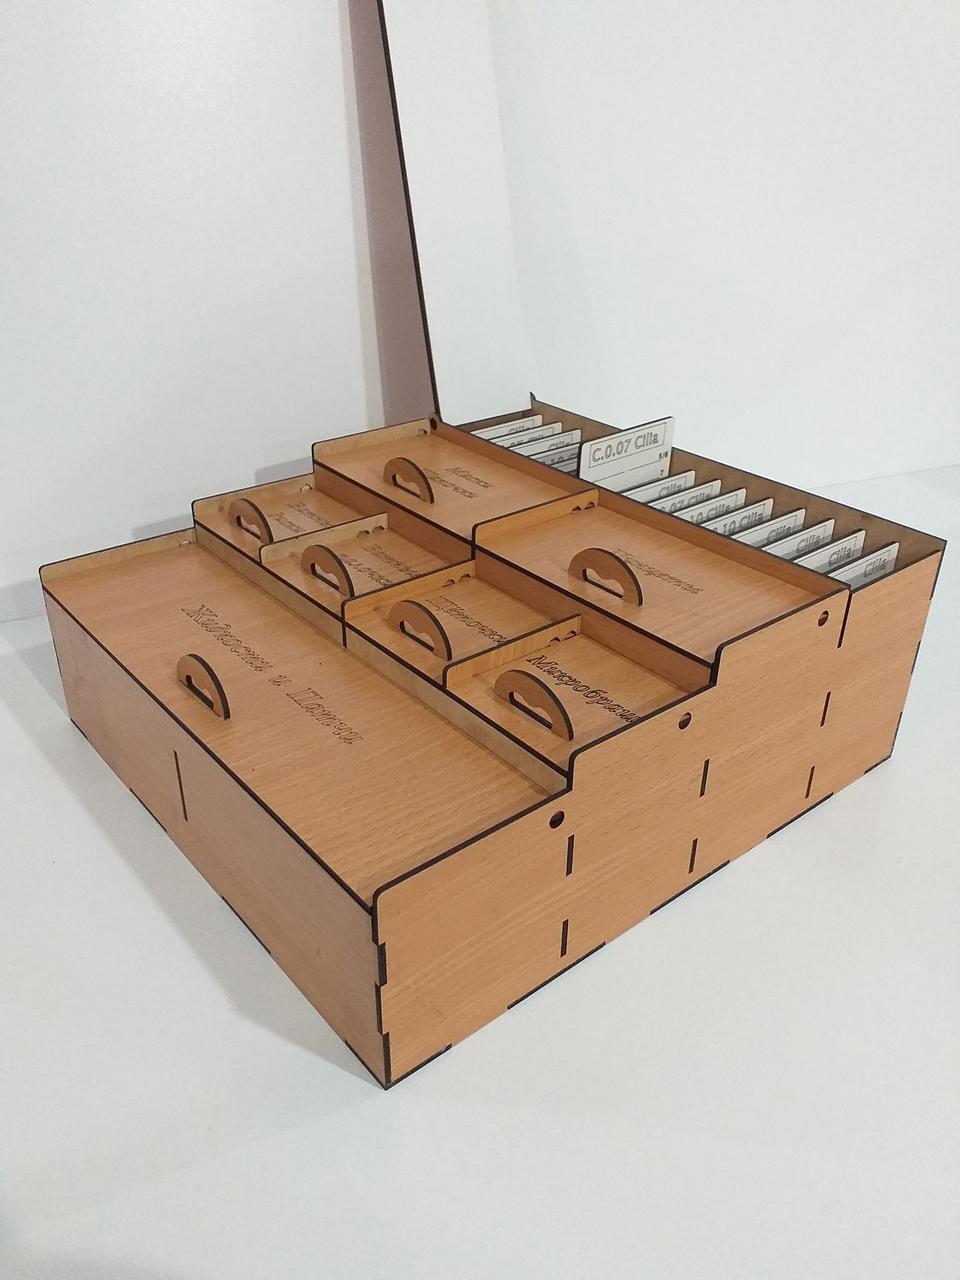 Лэшбокс для ресниц на 10+1 планшеток. Кейс для ресниц Lashbox 601